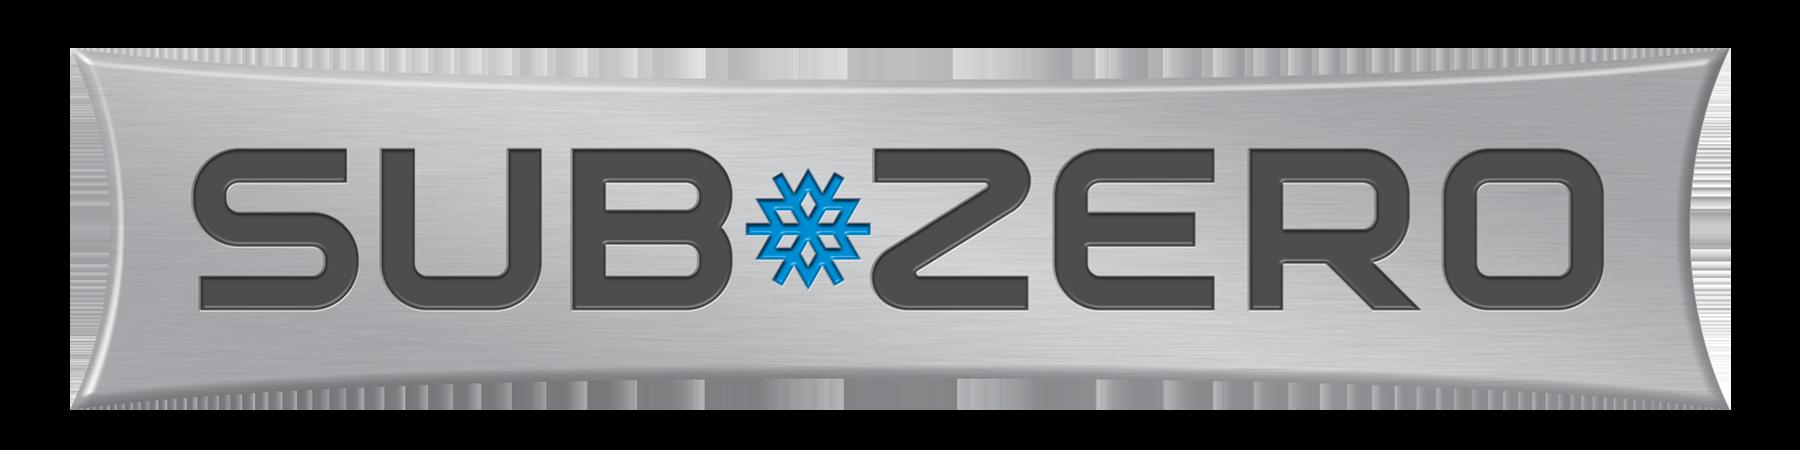 SZG_SM_3D_Badging_noreg_Horz_CMYK_Approved_Subzero.png